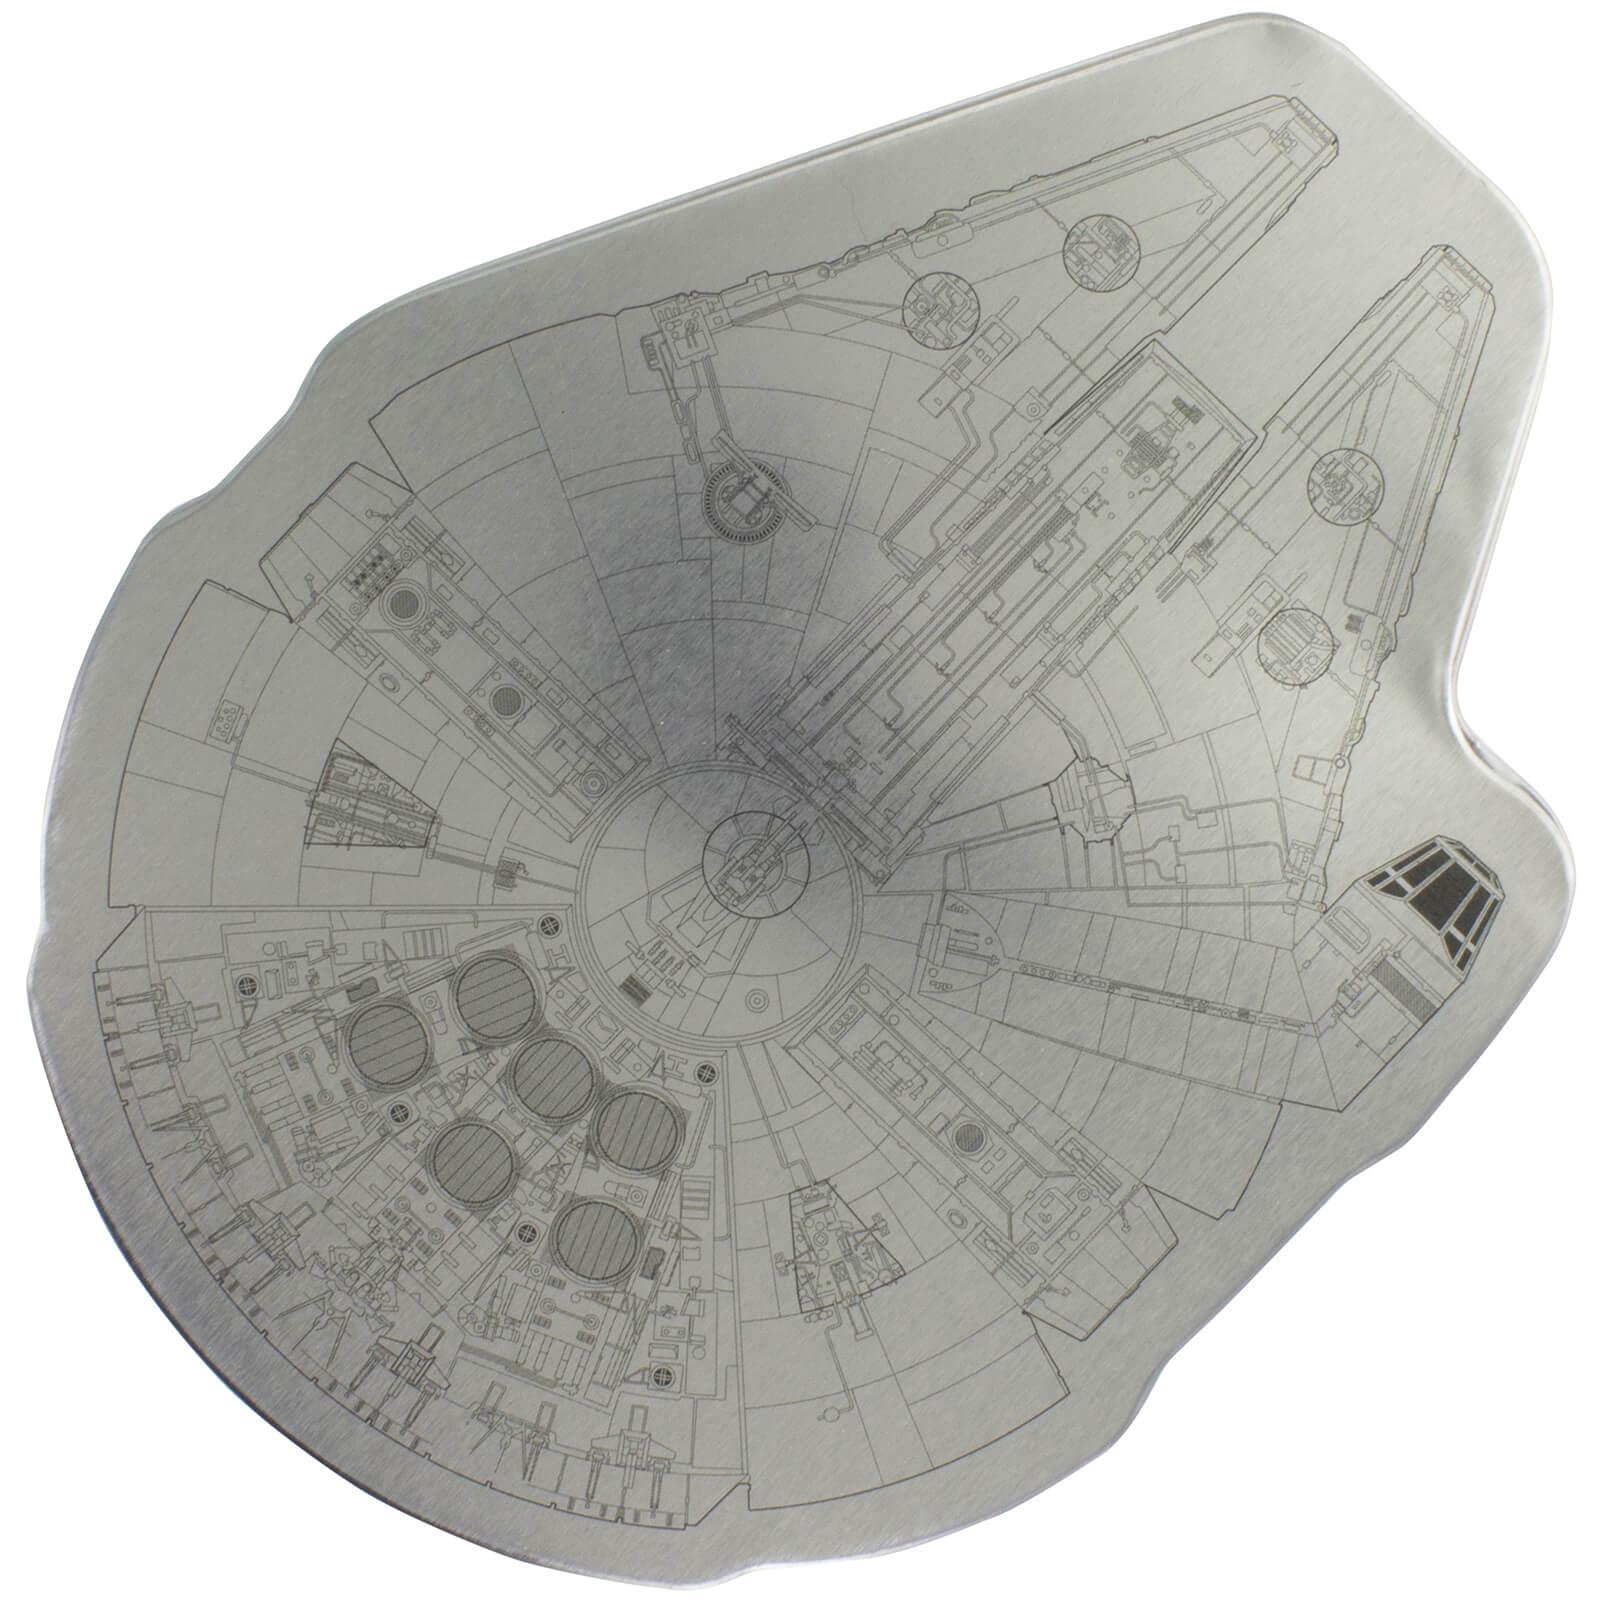 Paladone Star Wars Millennium Falcon Jigsaw